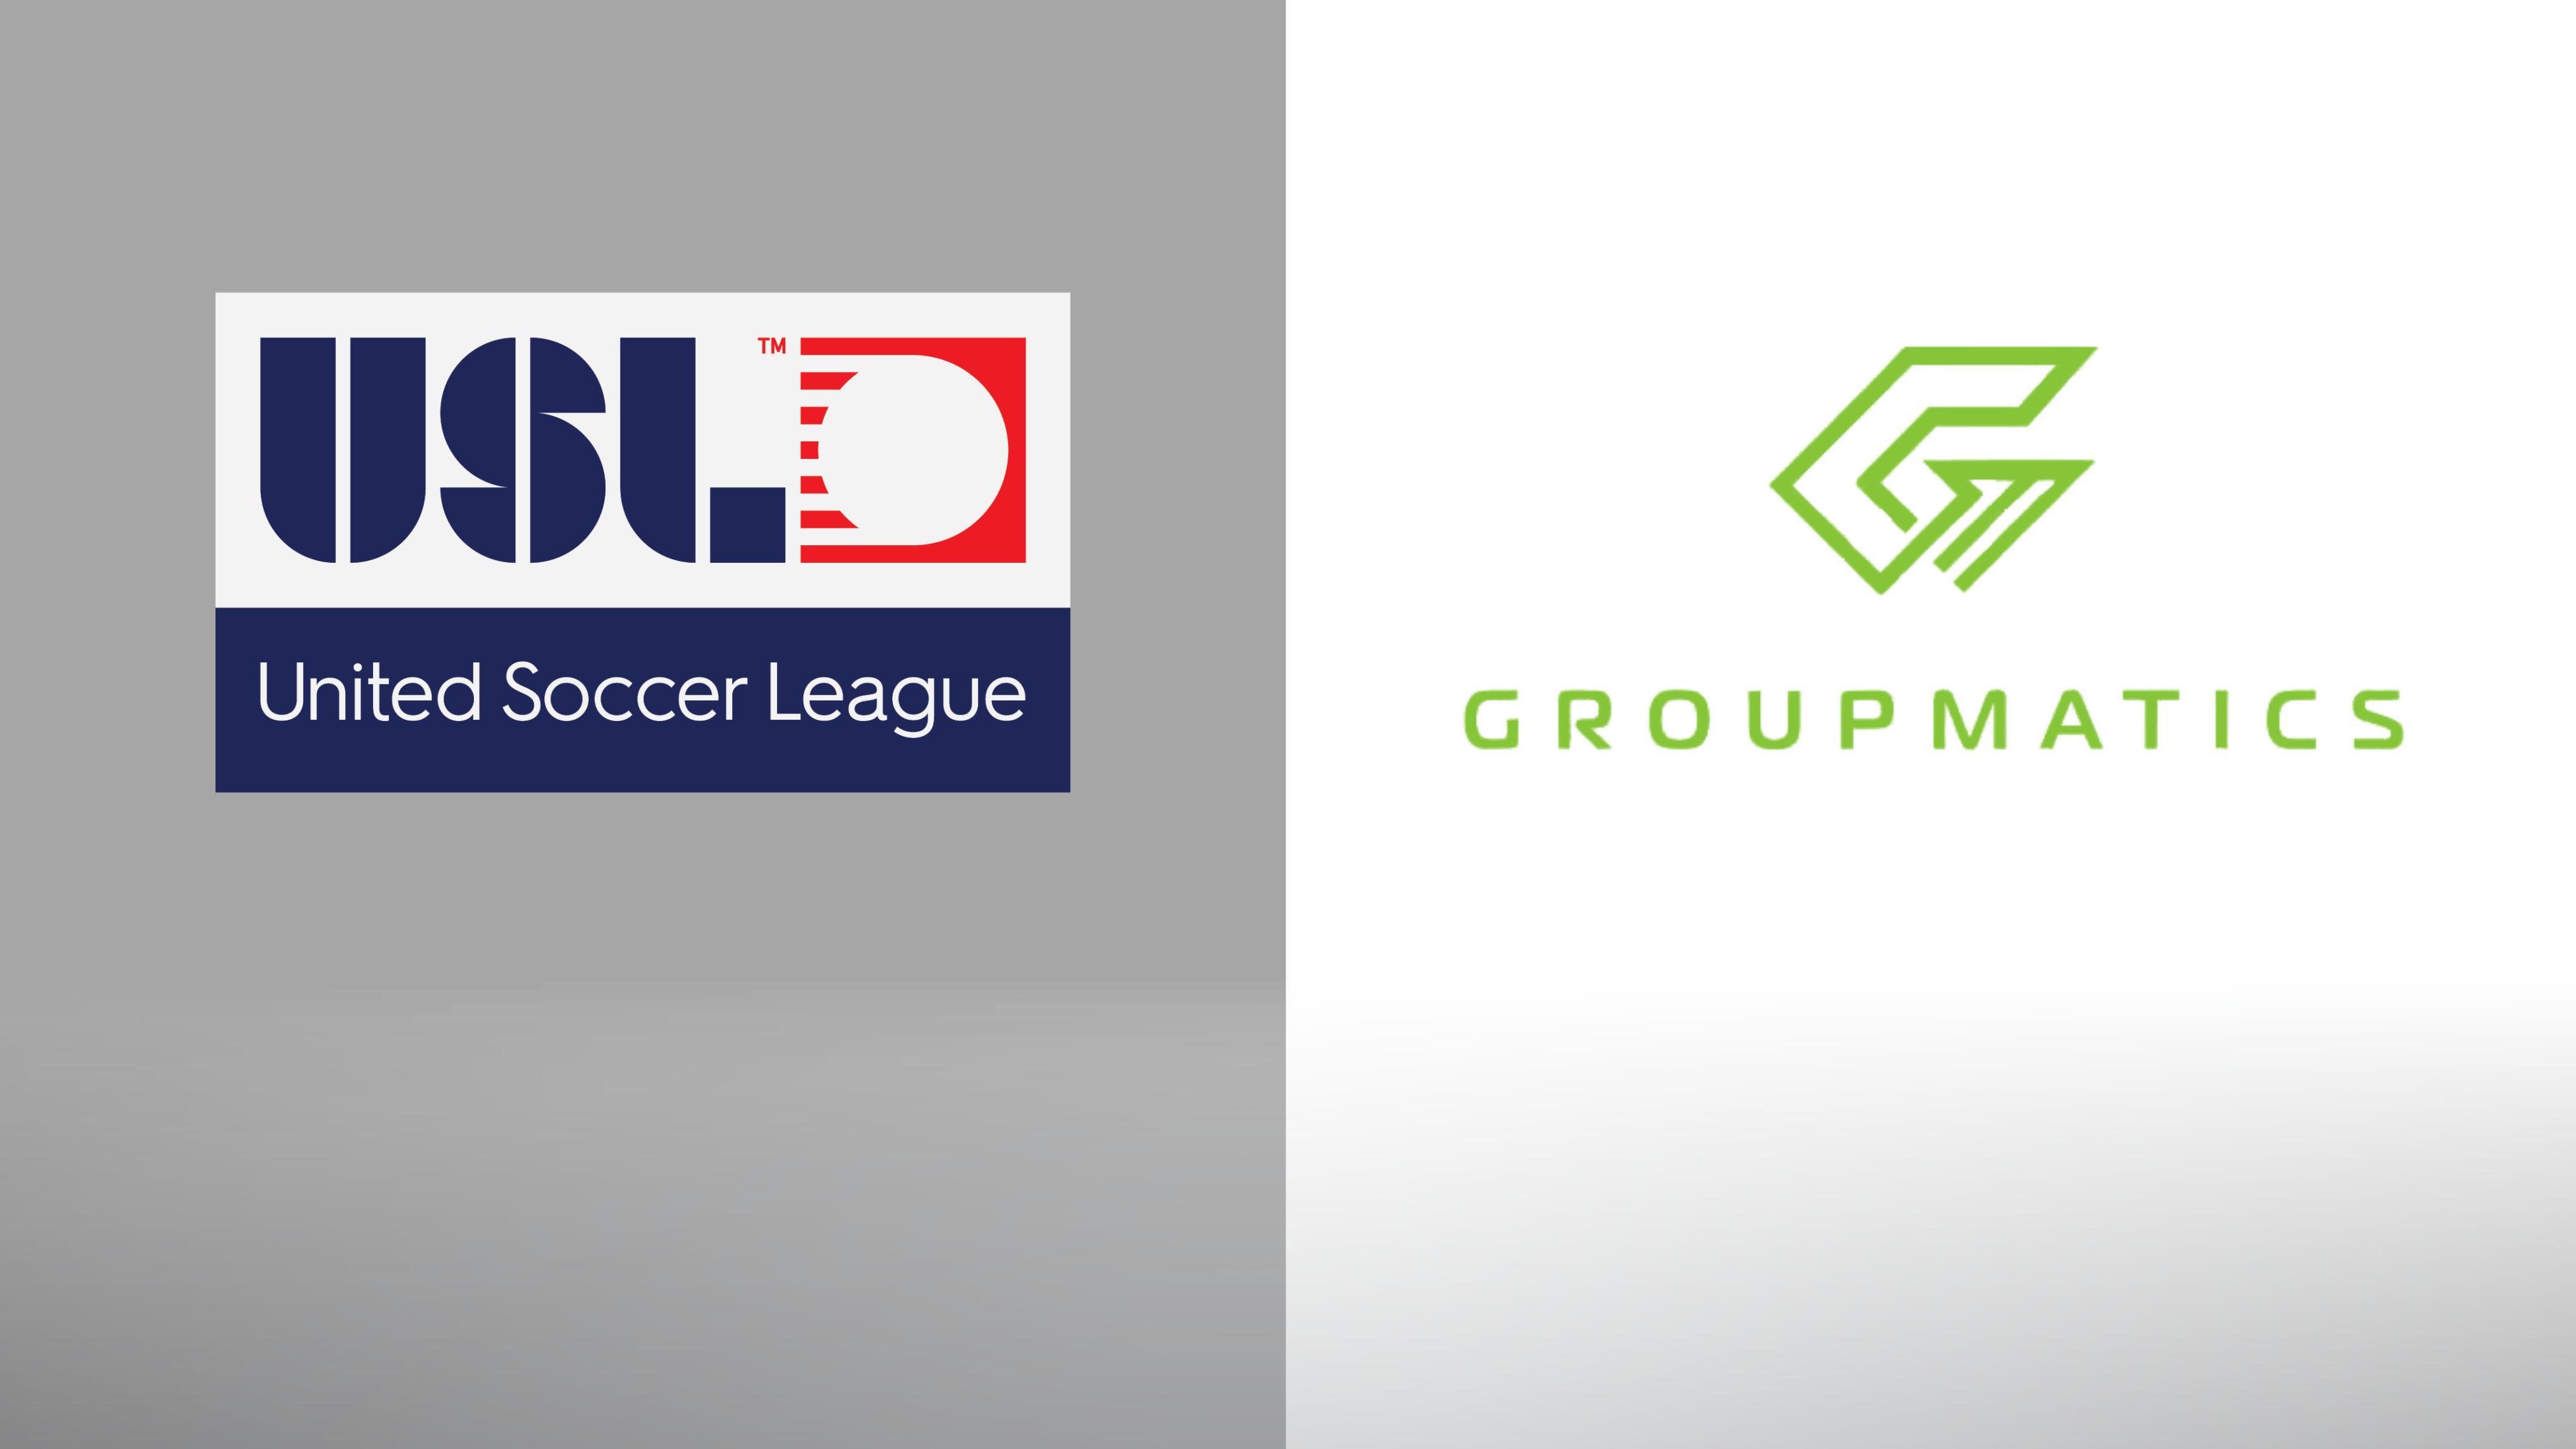 Groupmatics and USL